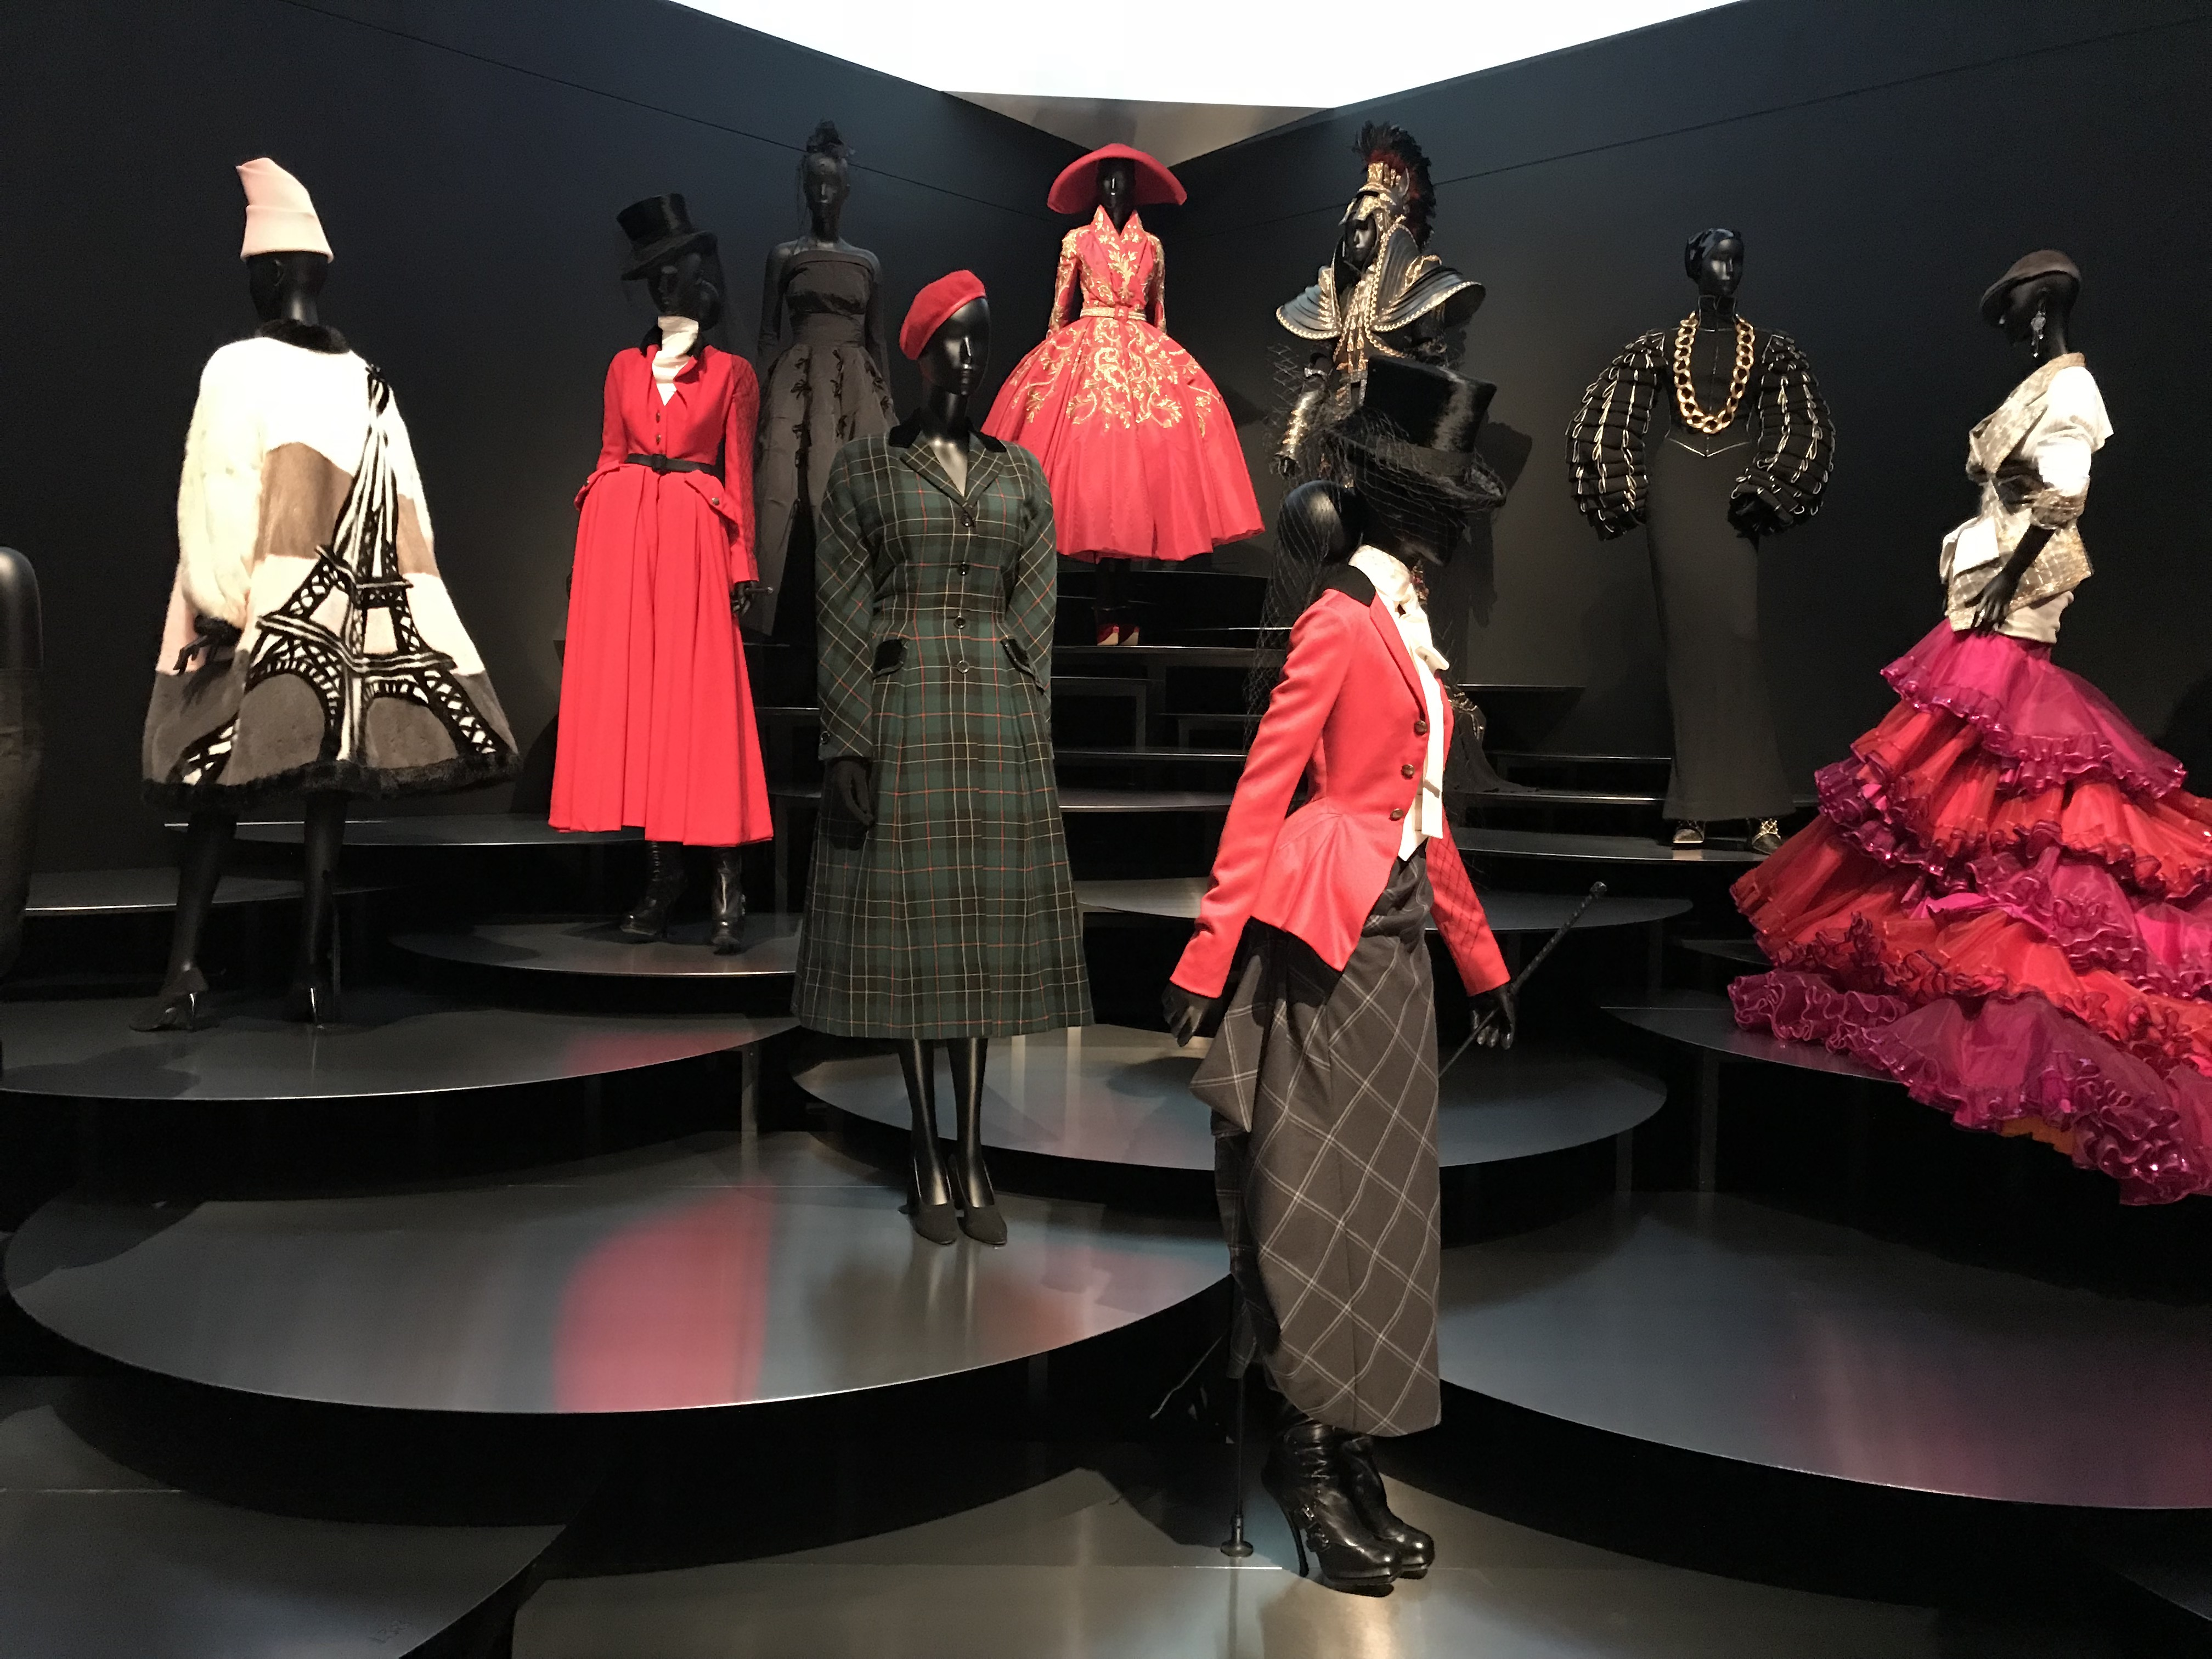 Dior | The Denver Look